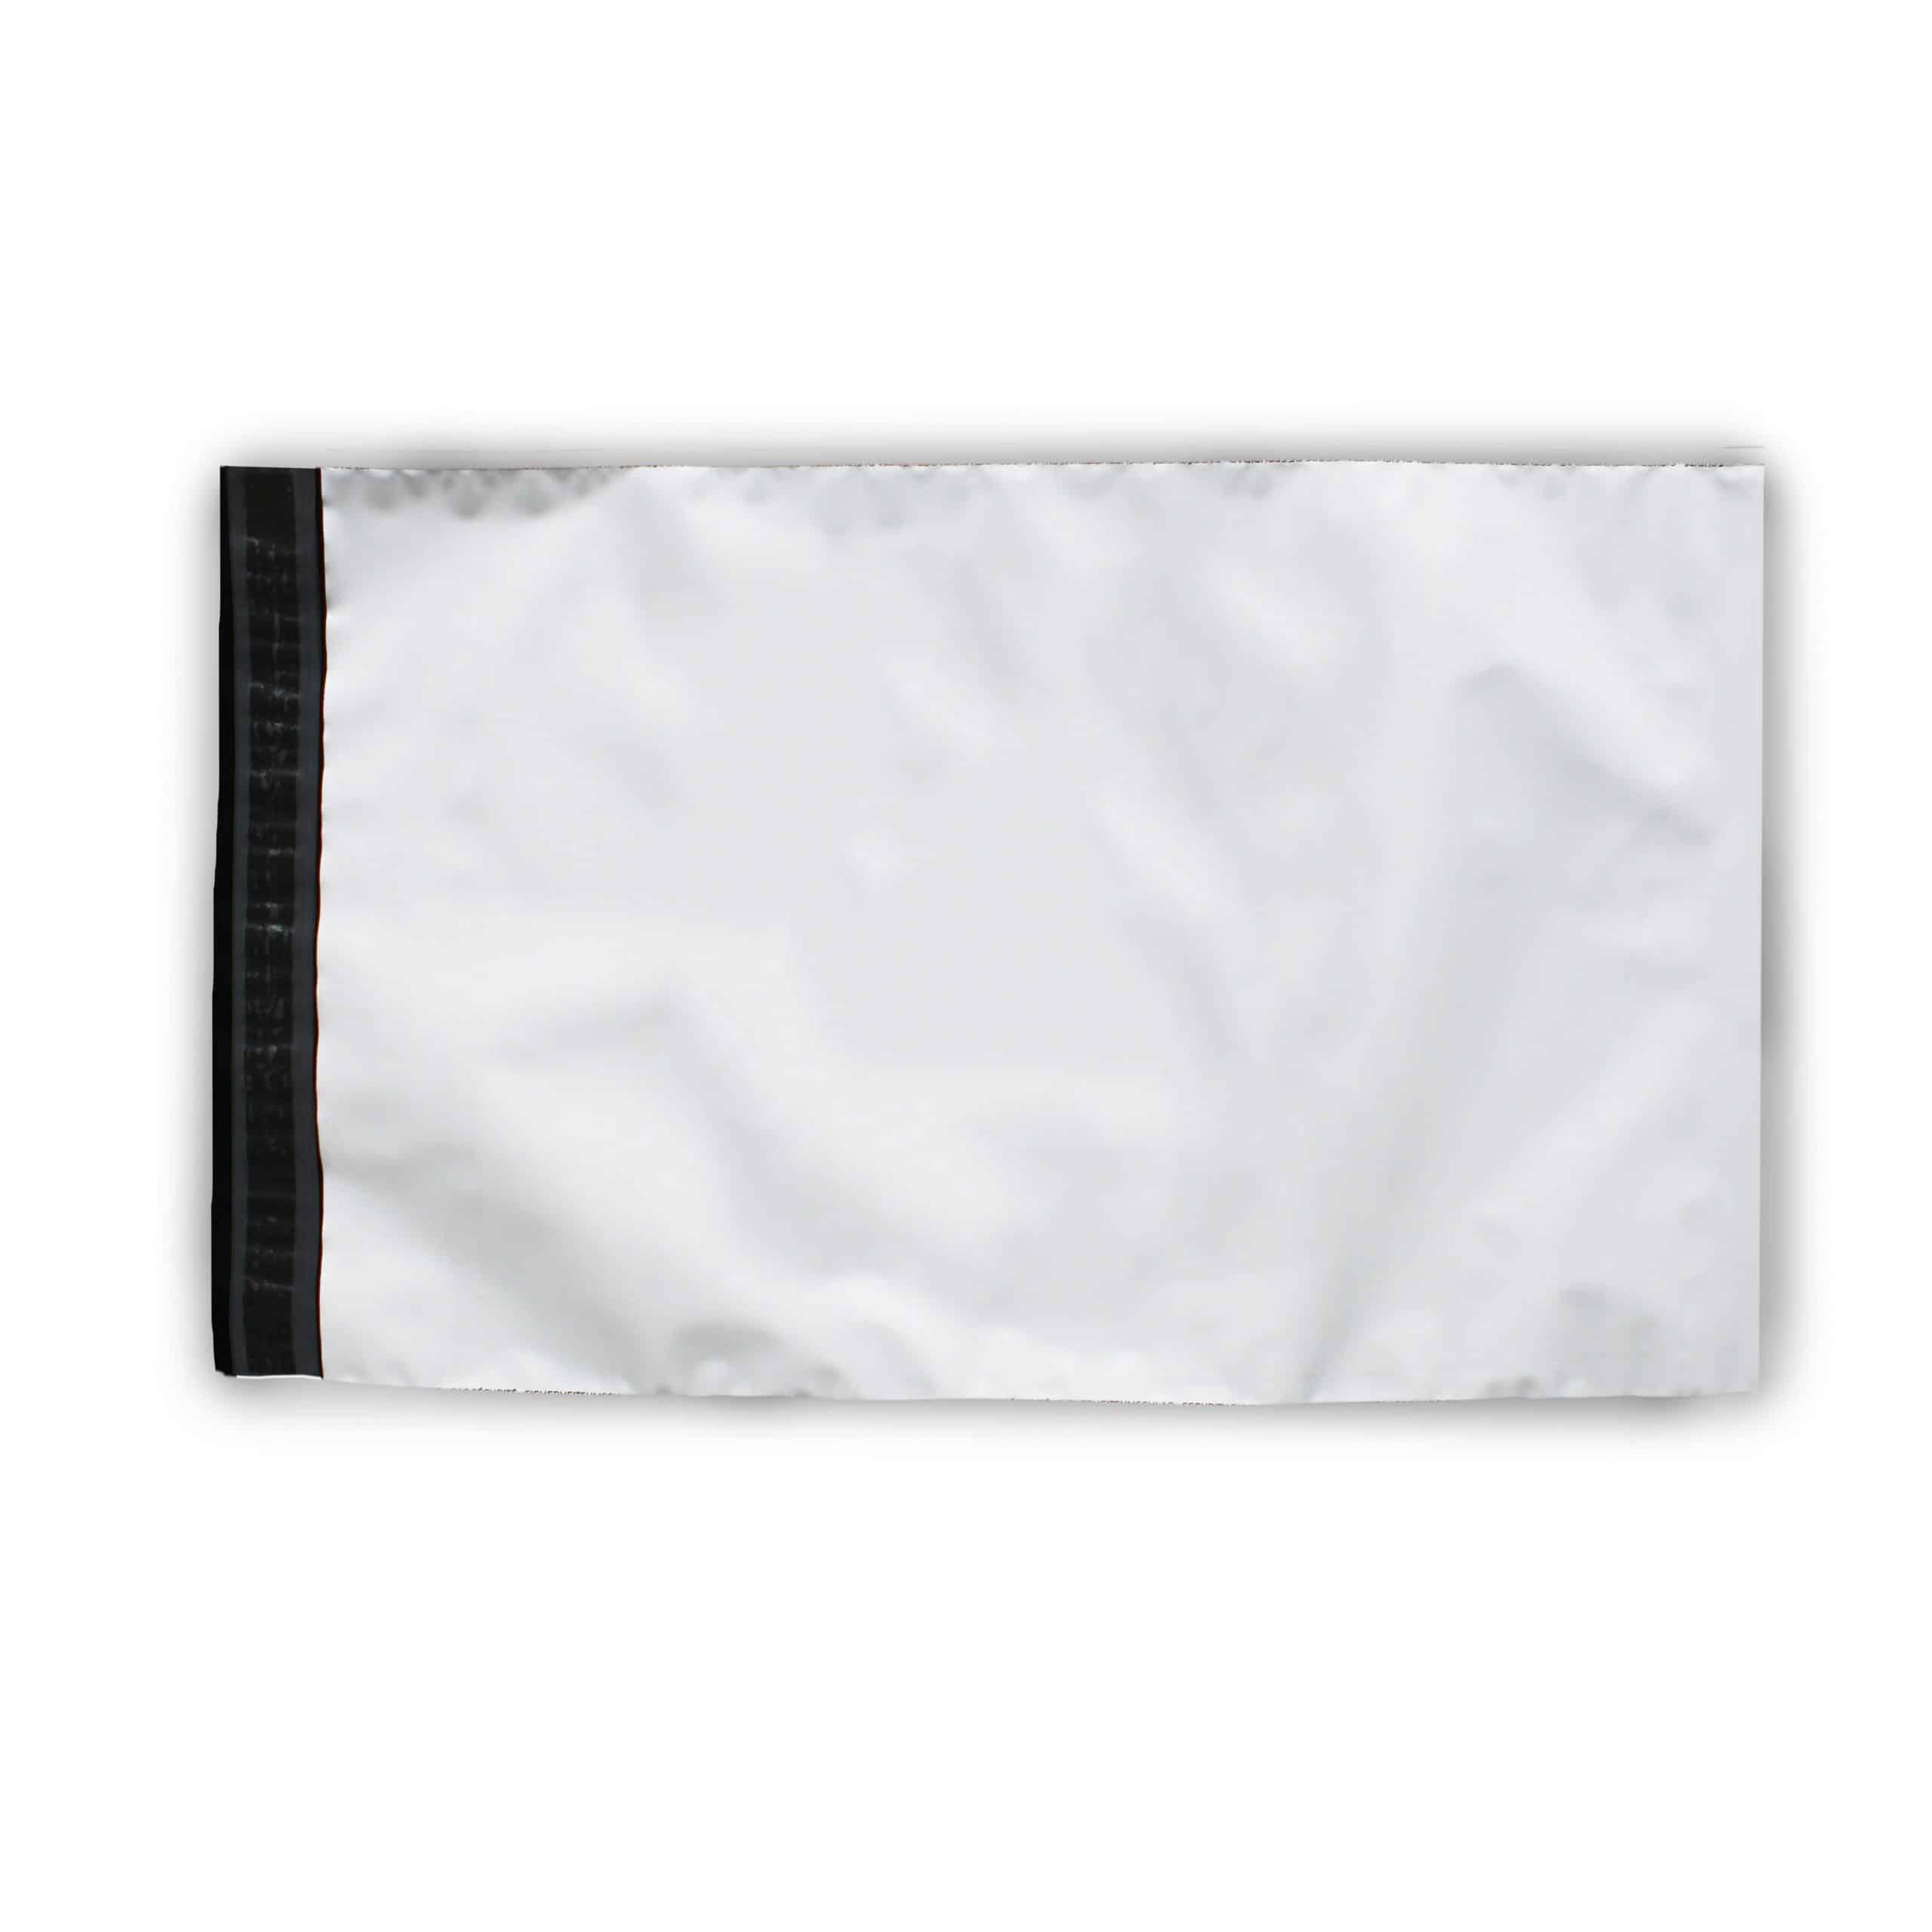 Busta flyer retro shipping bags envelopes Oniloc